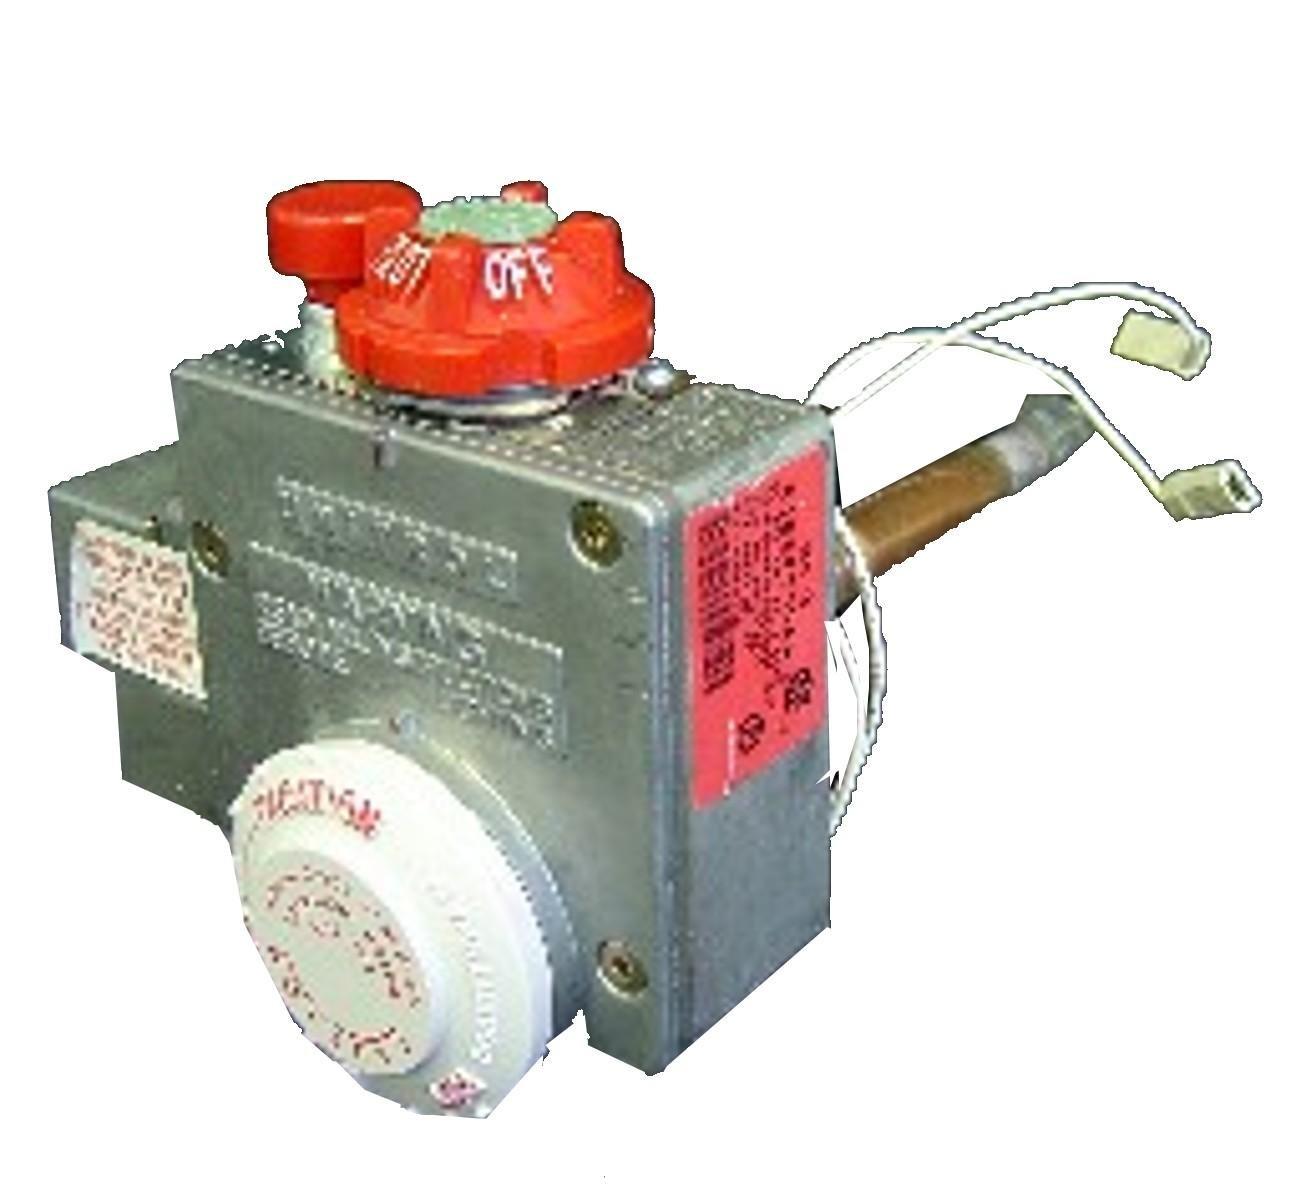 Bradford White 265-46182-01 Propane Gas Valve for Water Heater